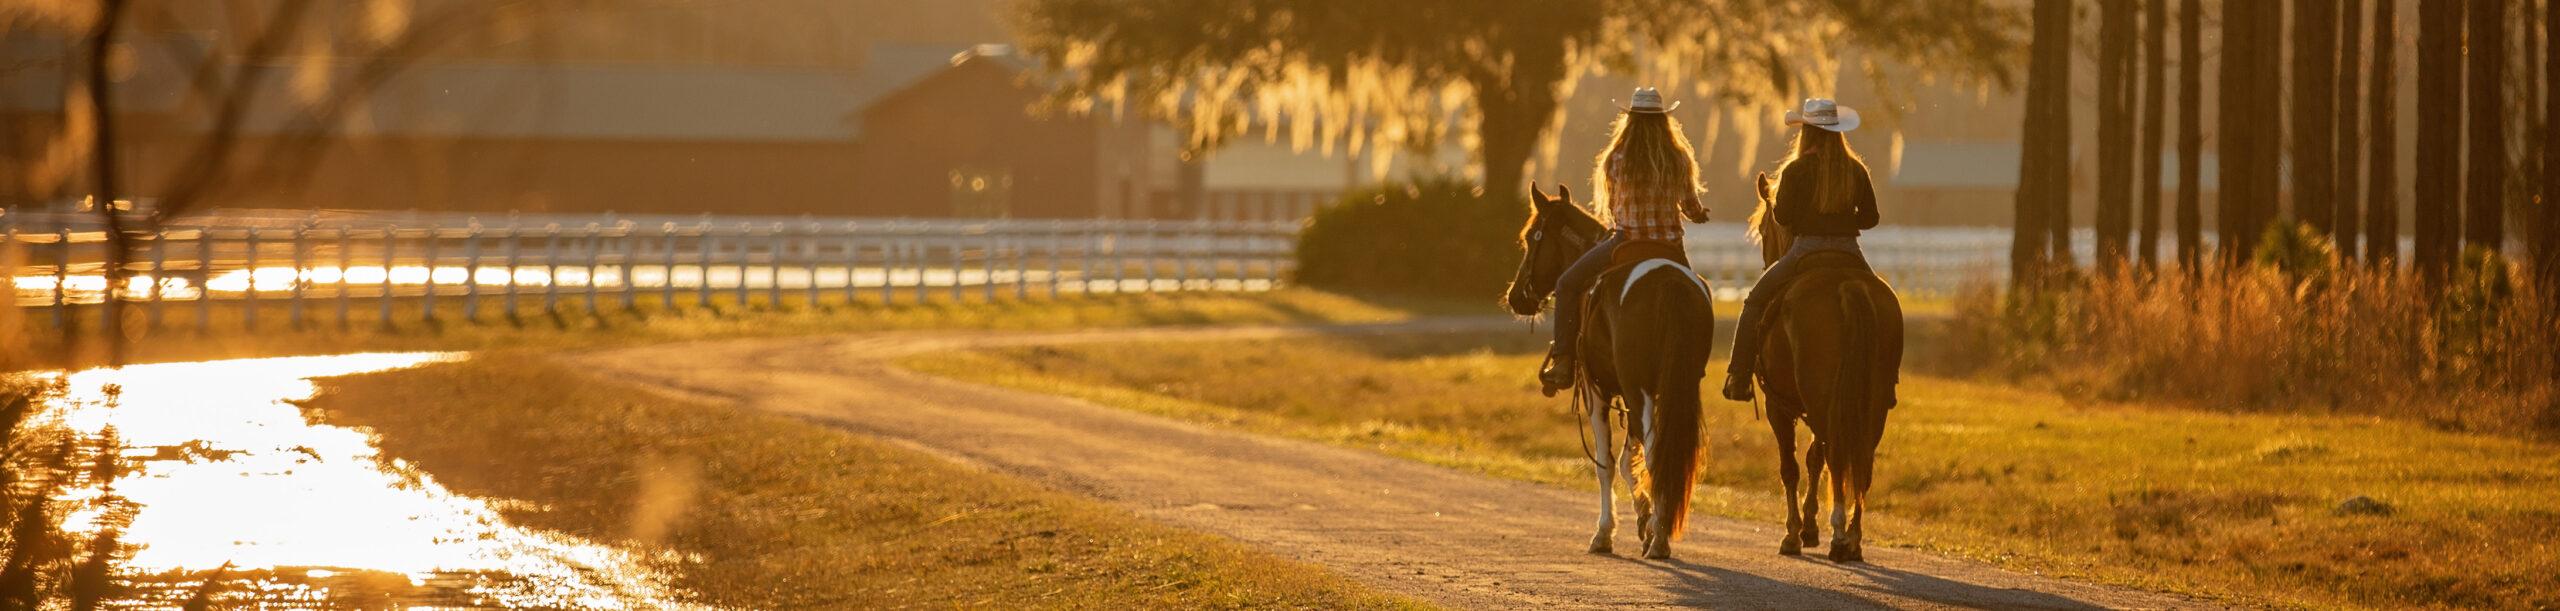 Girls riding mustang horses at sunset